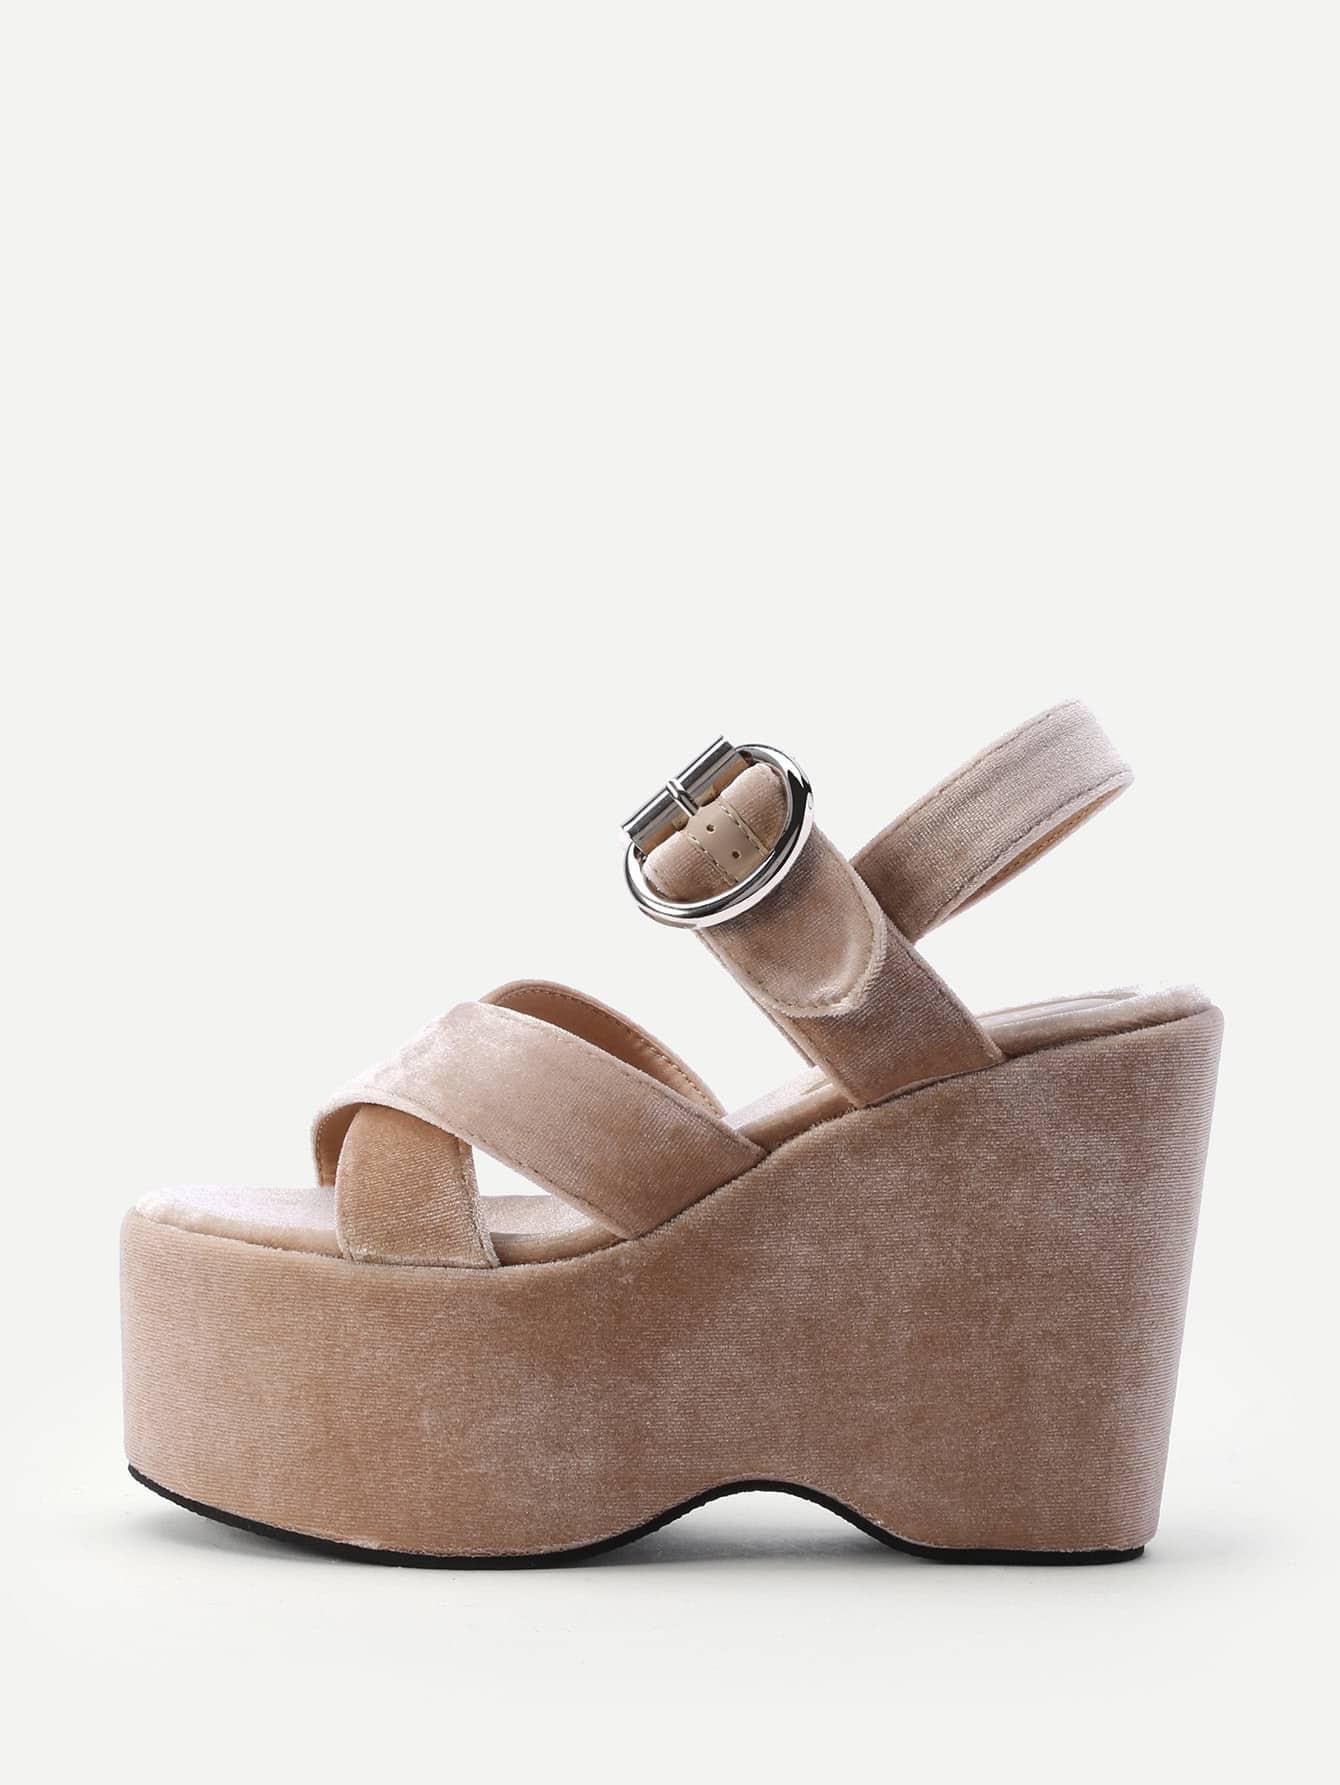 Фото Criss Cross Strappy Wedge Sandals. Купить с доставкой